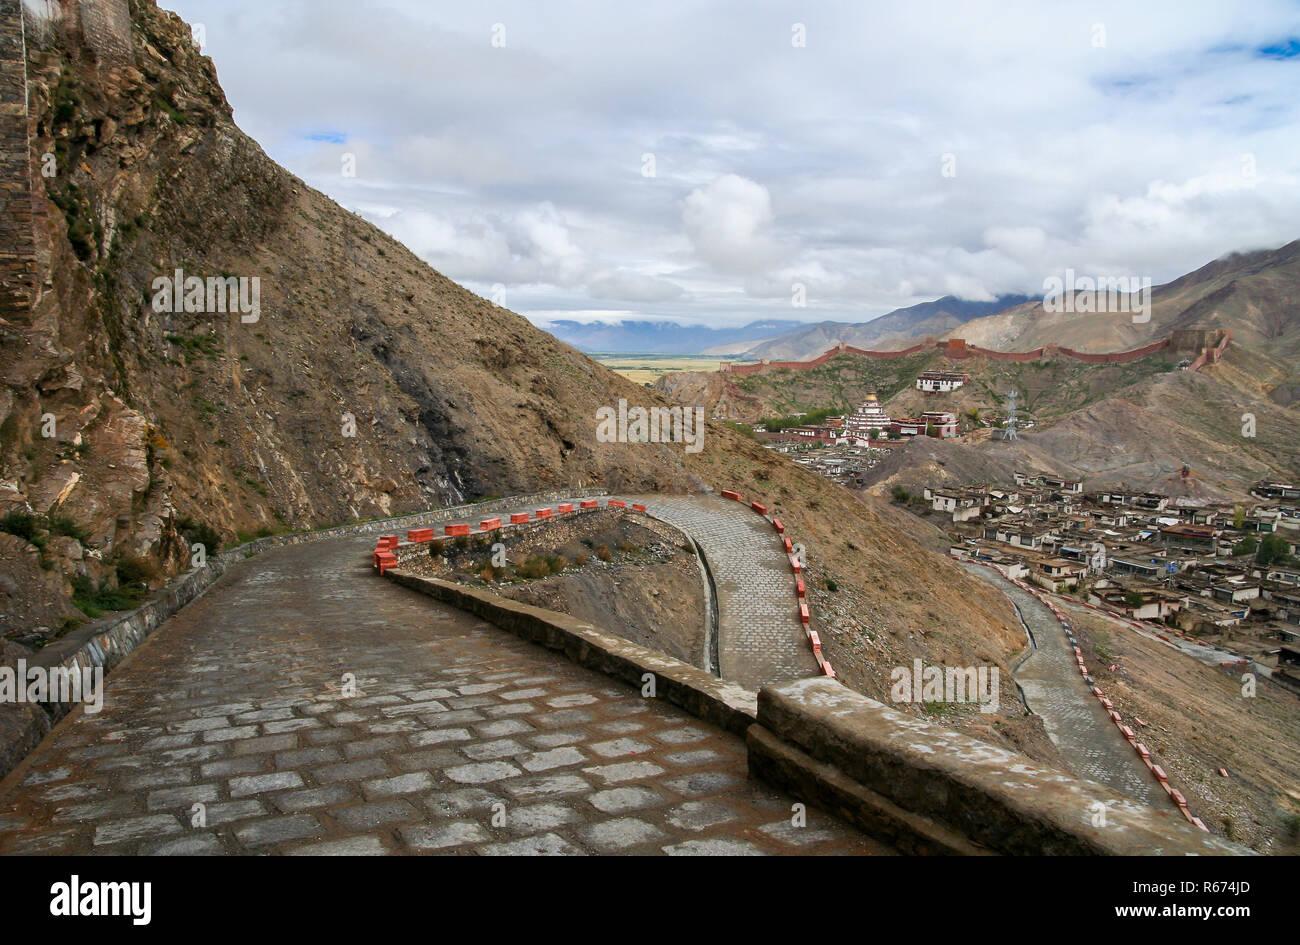 Winding road to the monastery in Gyantse - Stock Image